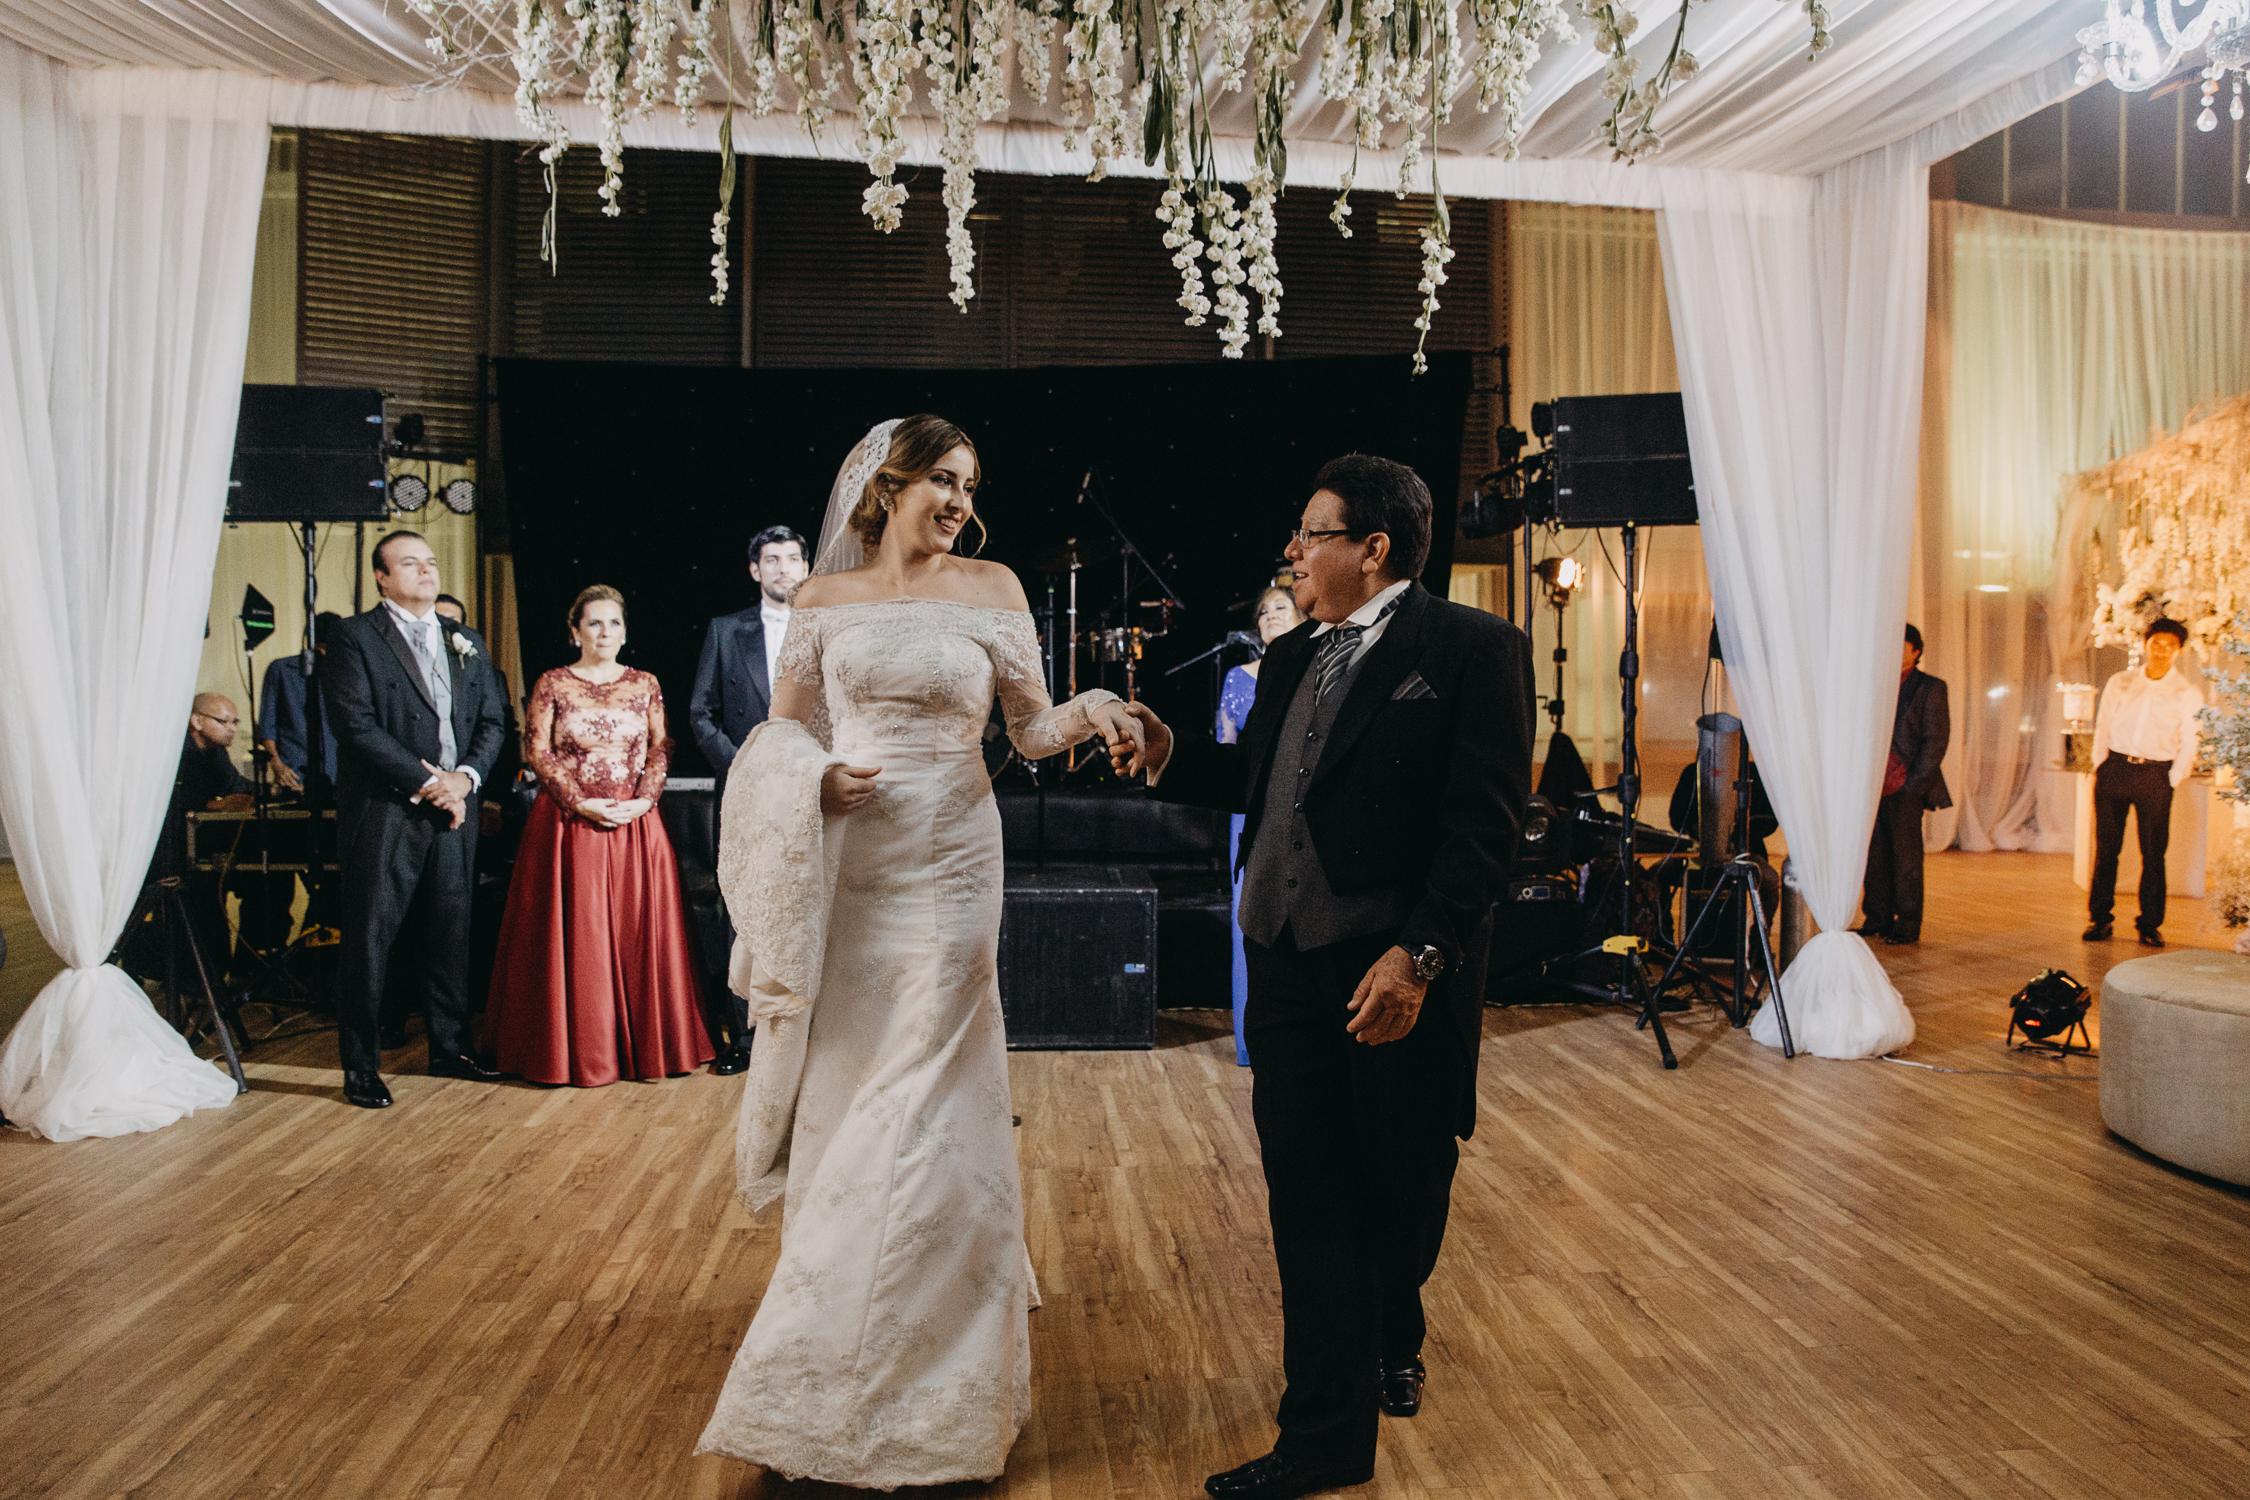 Michelle-Agurto-Fotografia-Bodas-Ecuador-Destination-Wedding-Photographer-Vicky-Javier-135.JPG